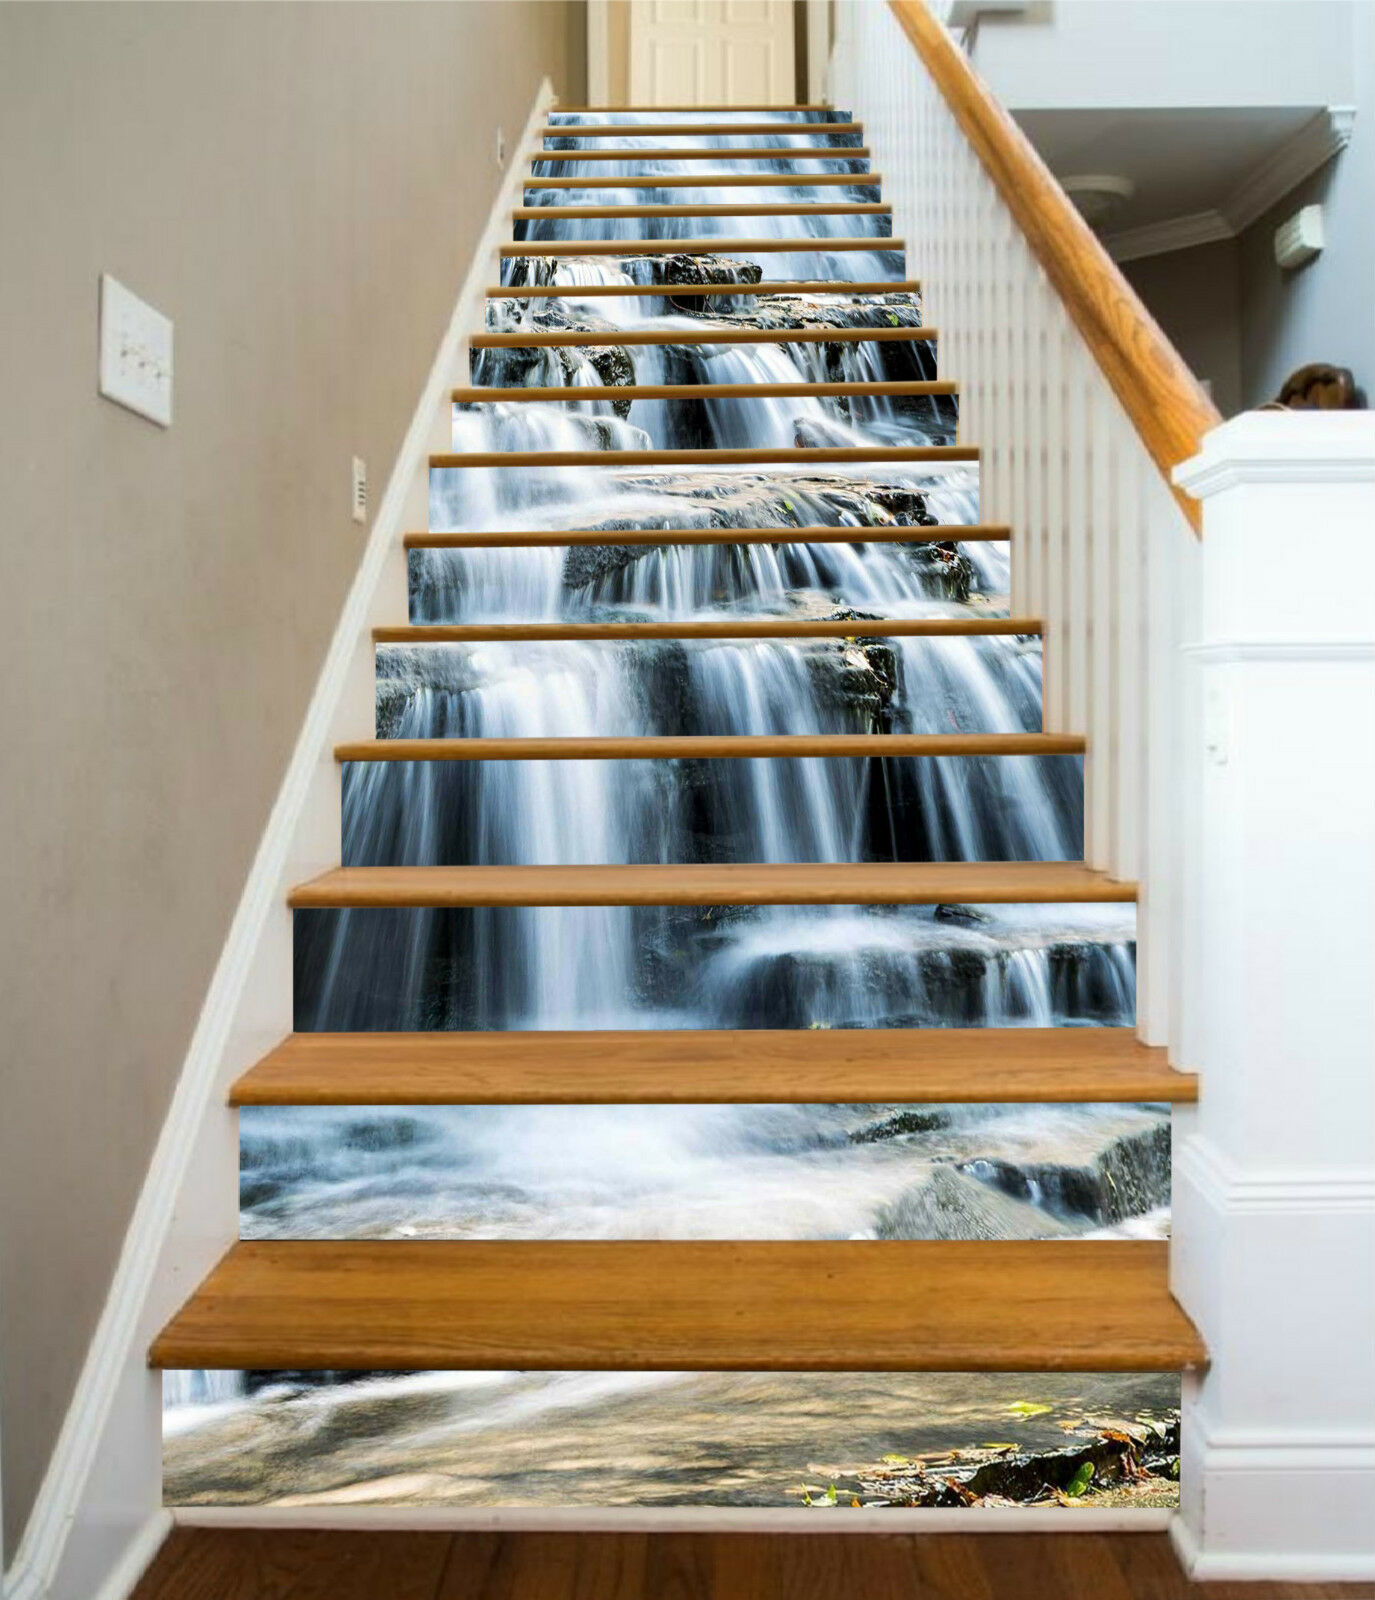 3D Wasserfall 006 Stair Risers Dekoration Fototapete Vinyl Aufkleber Tapete DE